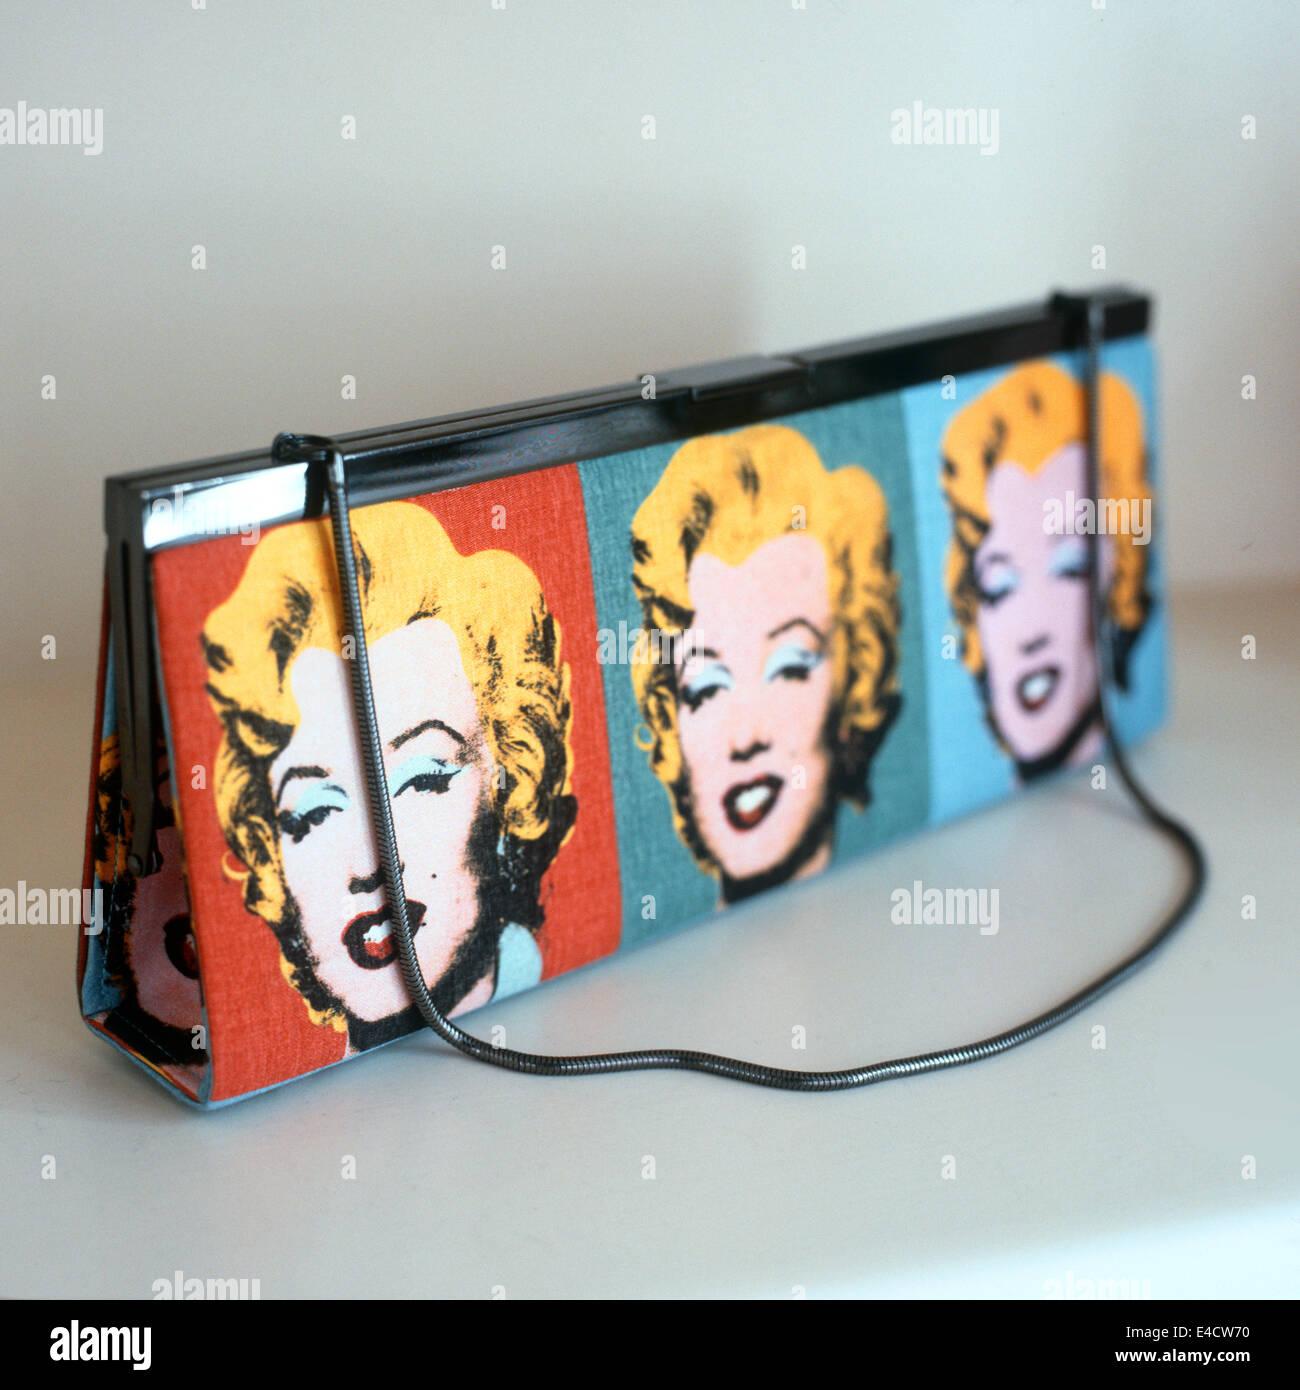 Warhol Marilyn print handbag / purse - Stock Image